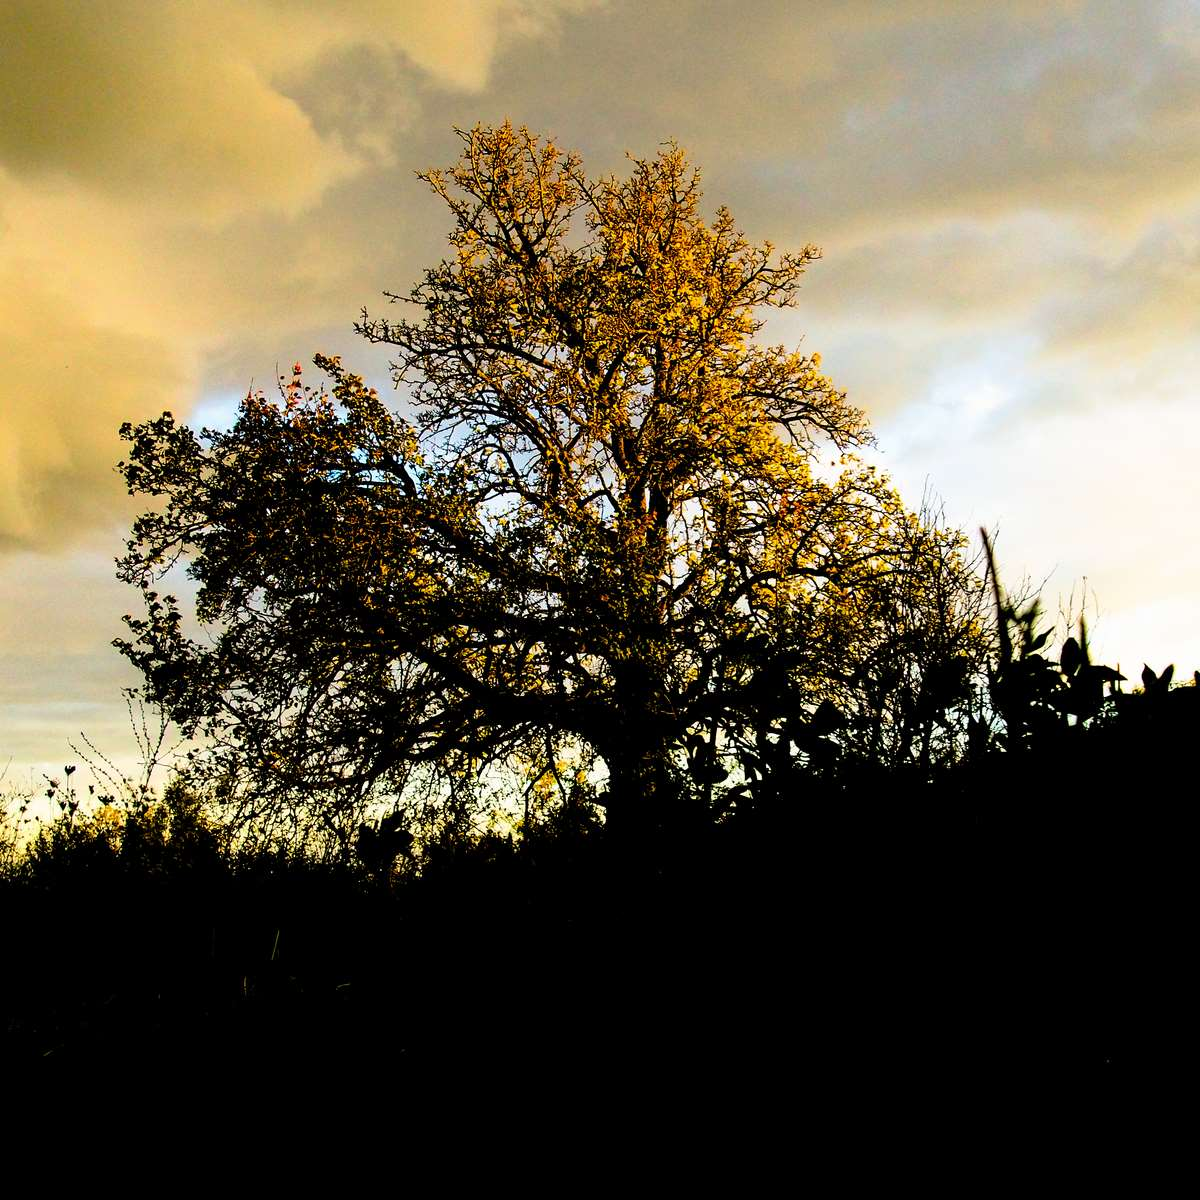 Tree in the late evening sun